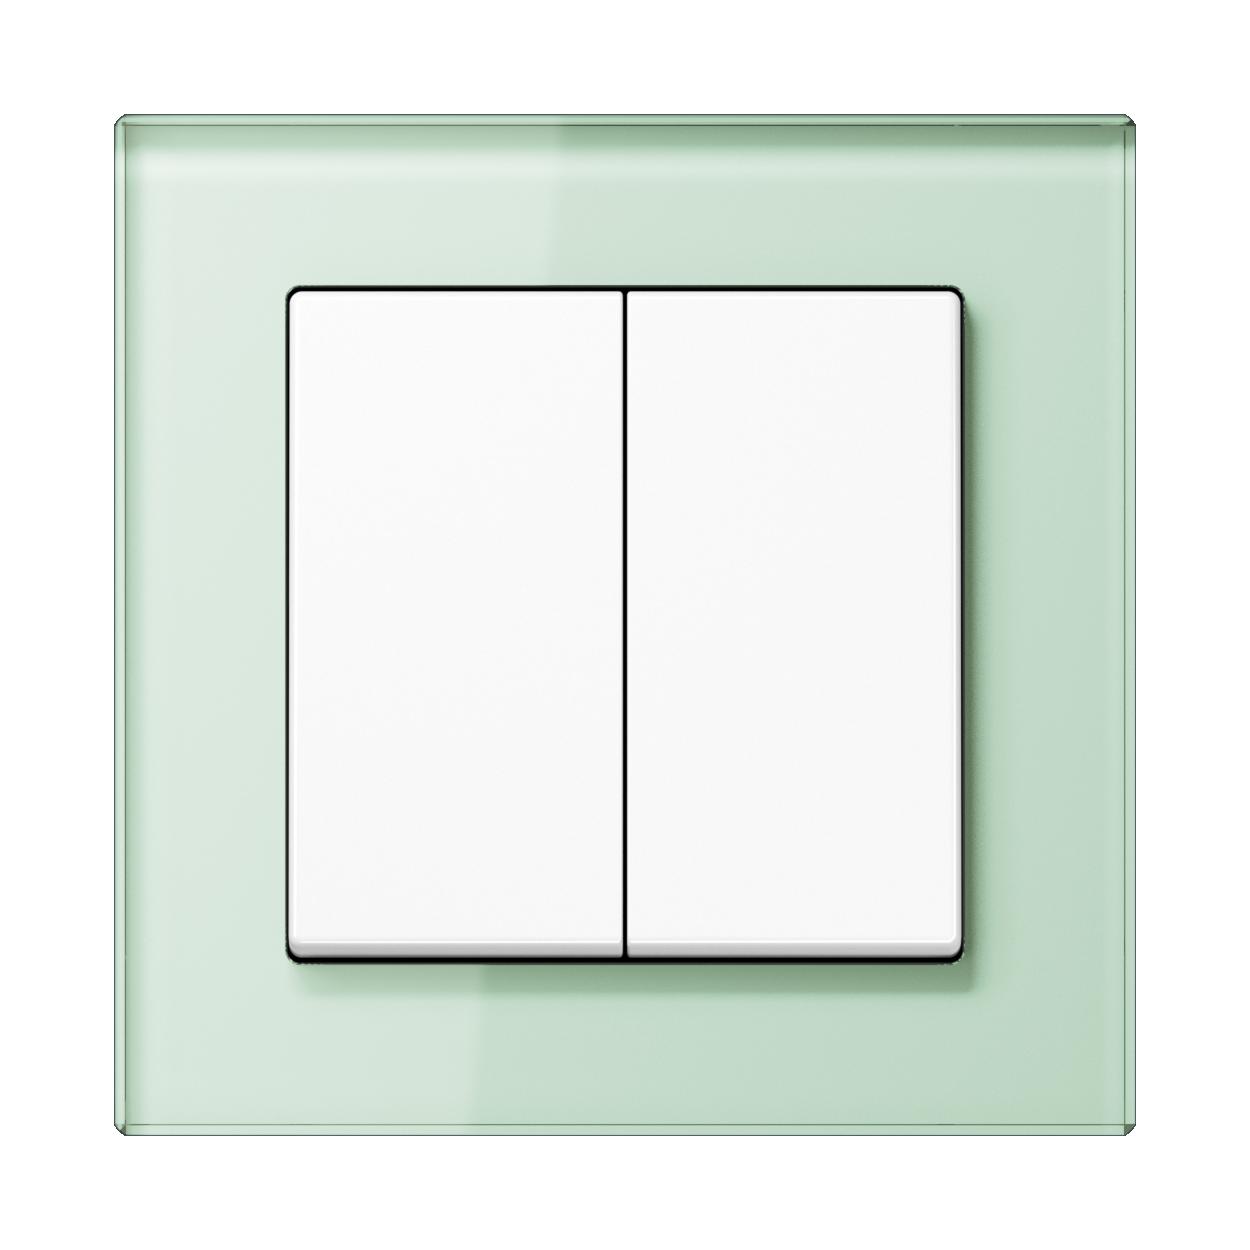 JUNG_AC_GL_soft-white_2-gang-switch